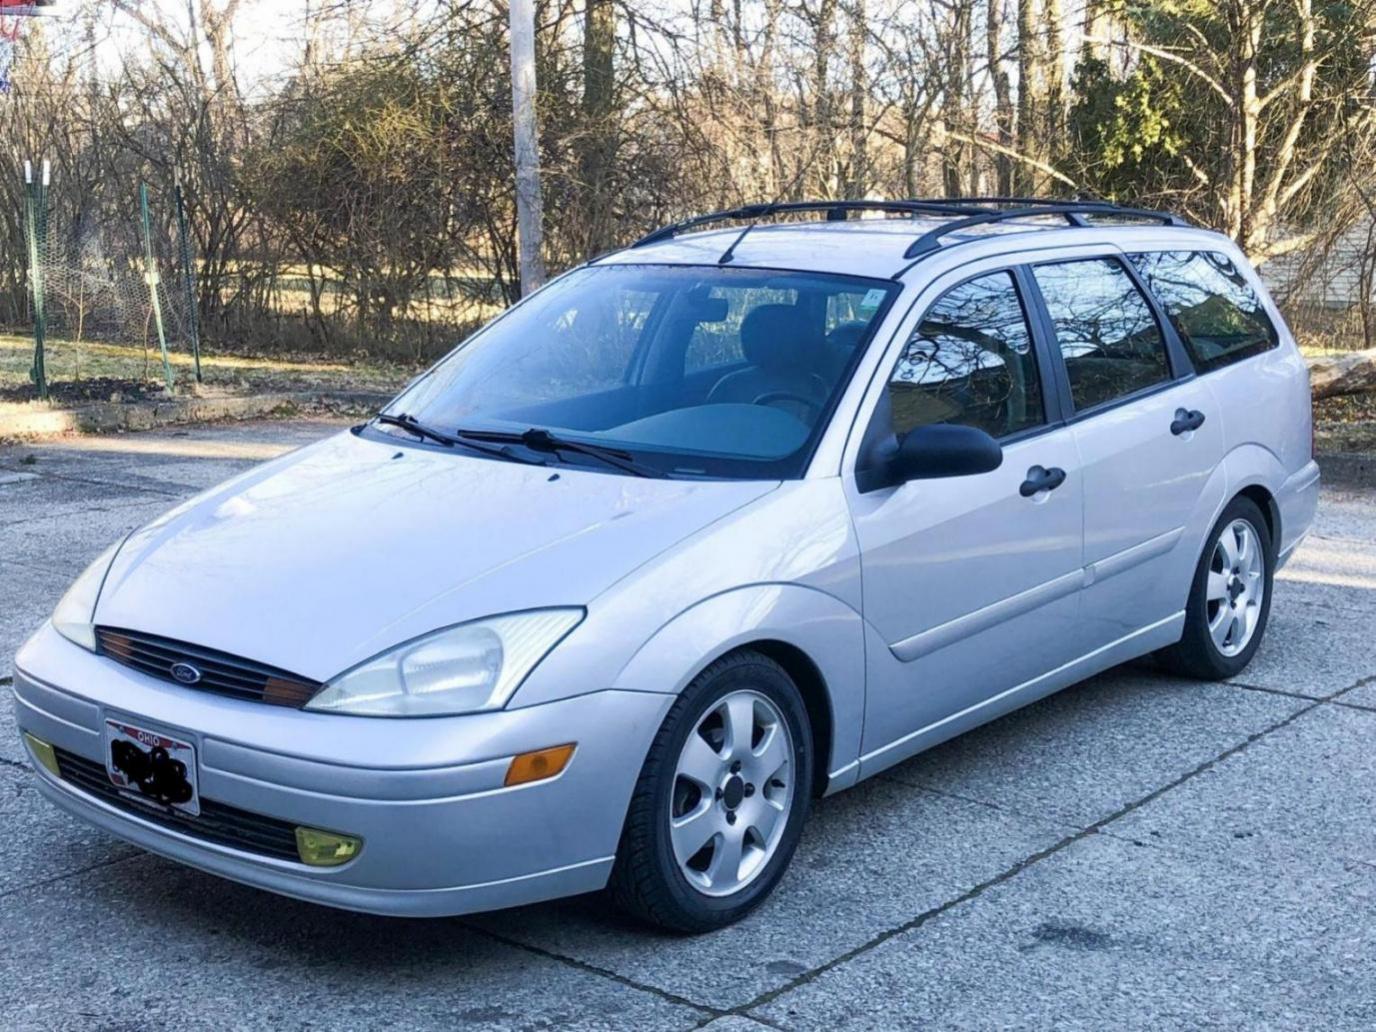 2001 SE WAGON for sale-8abf79bb-a547-445c-9338-59aac3ffb273_1558238793782.jpg